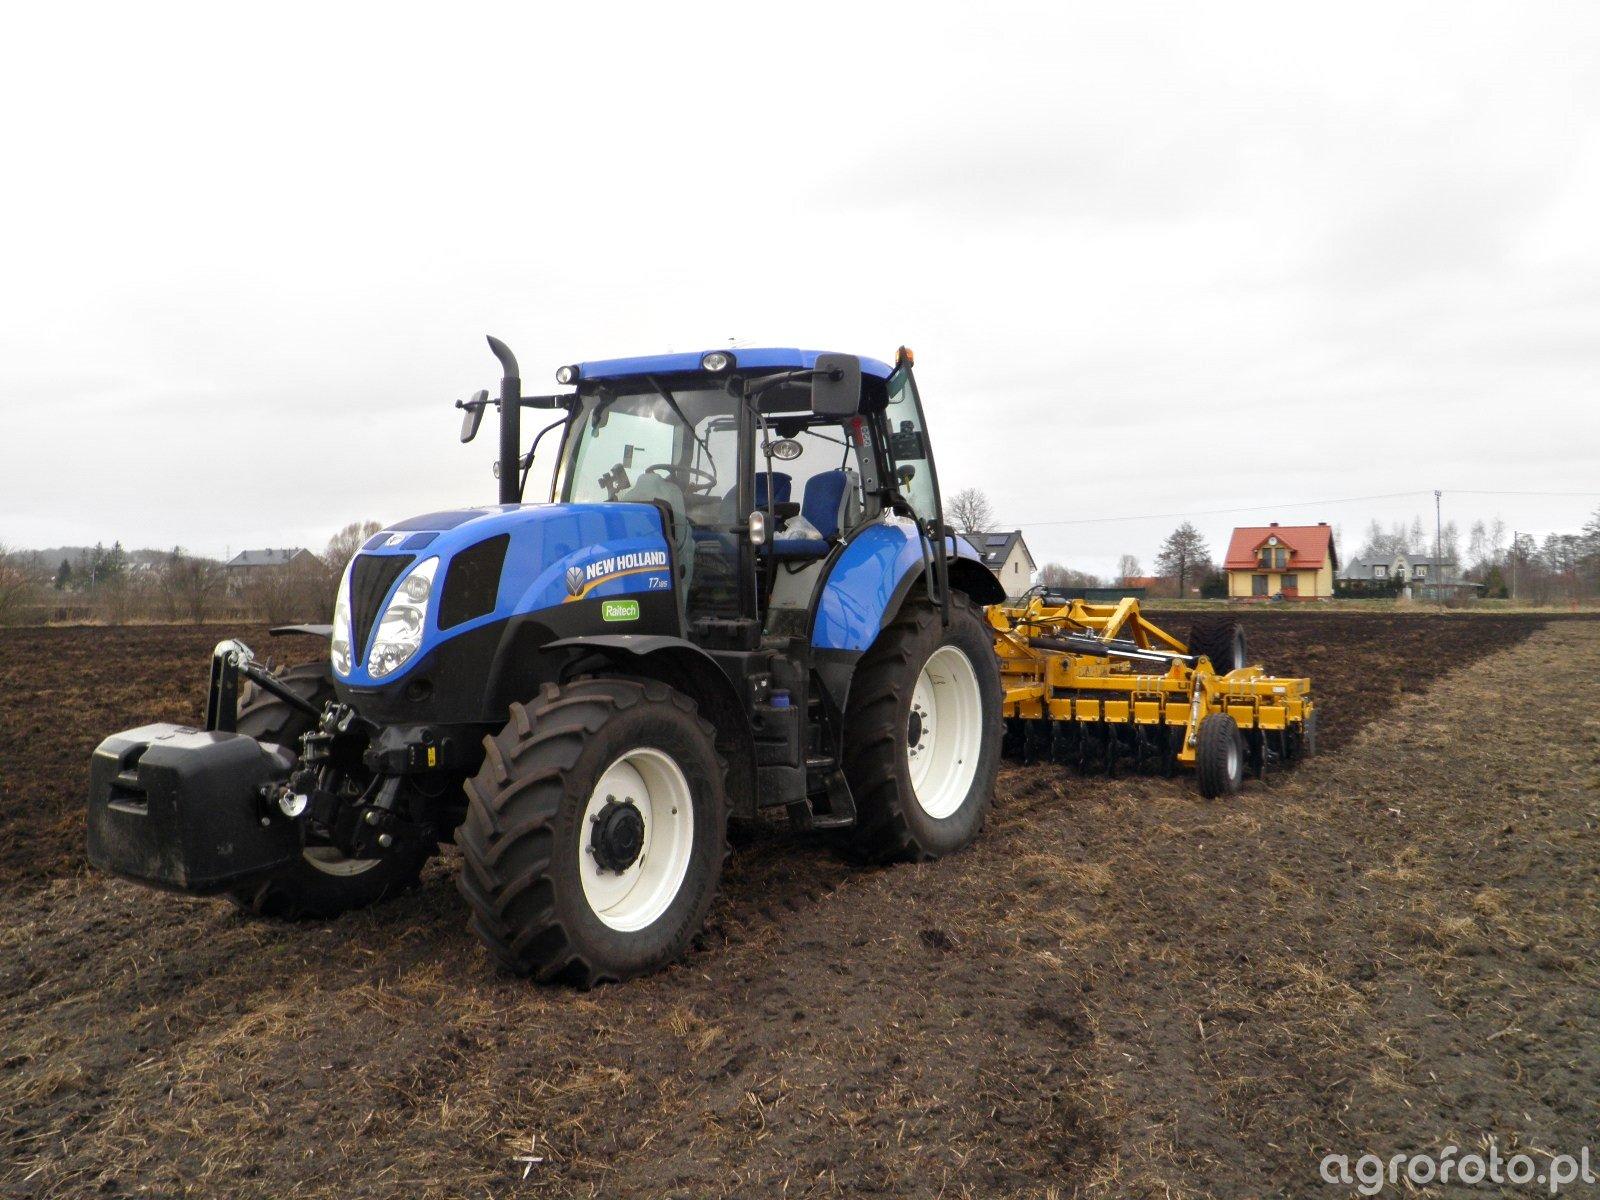 New Holland T7 & Staltech